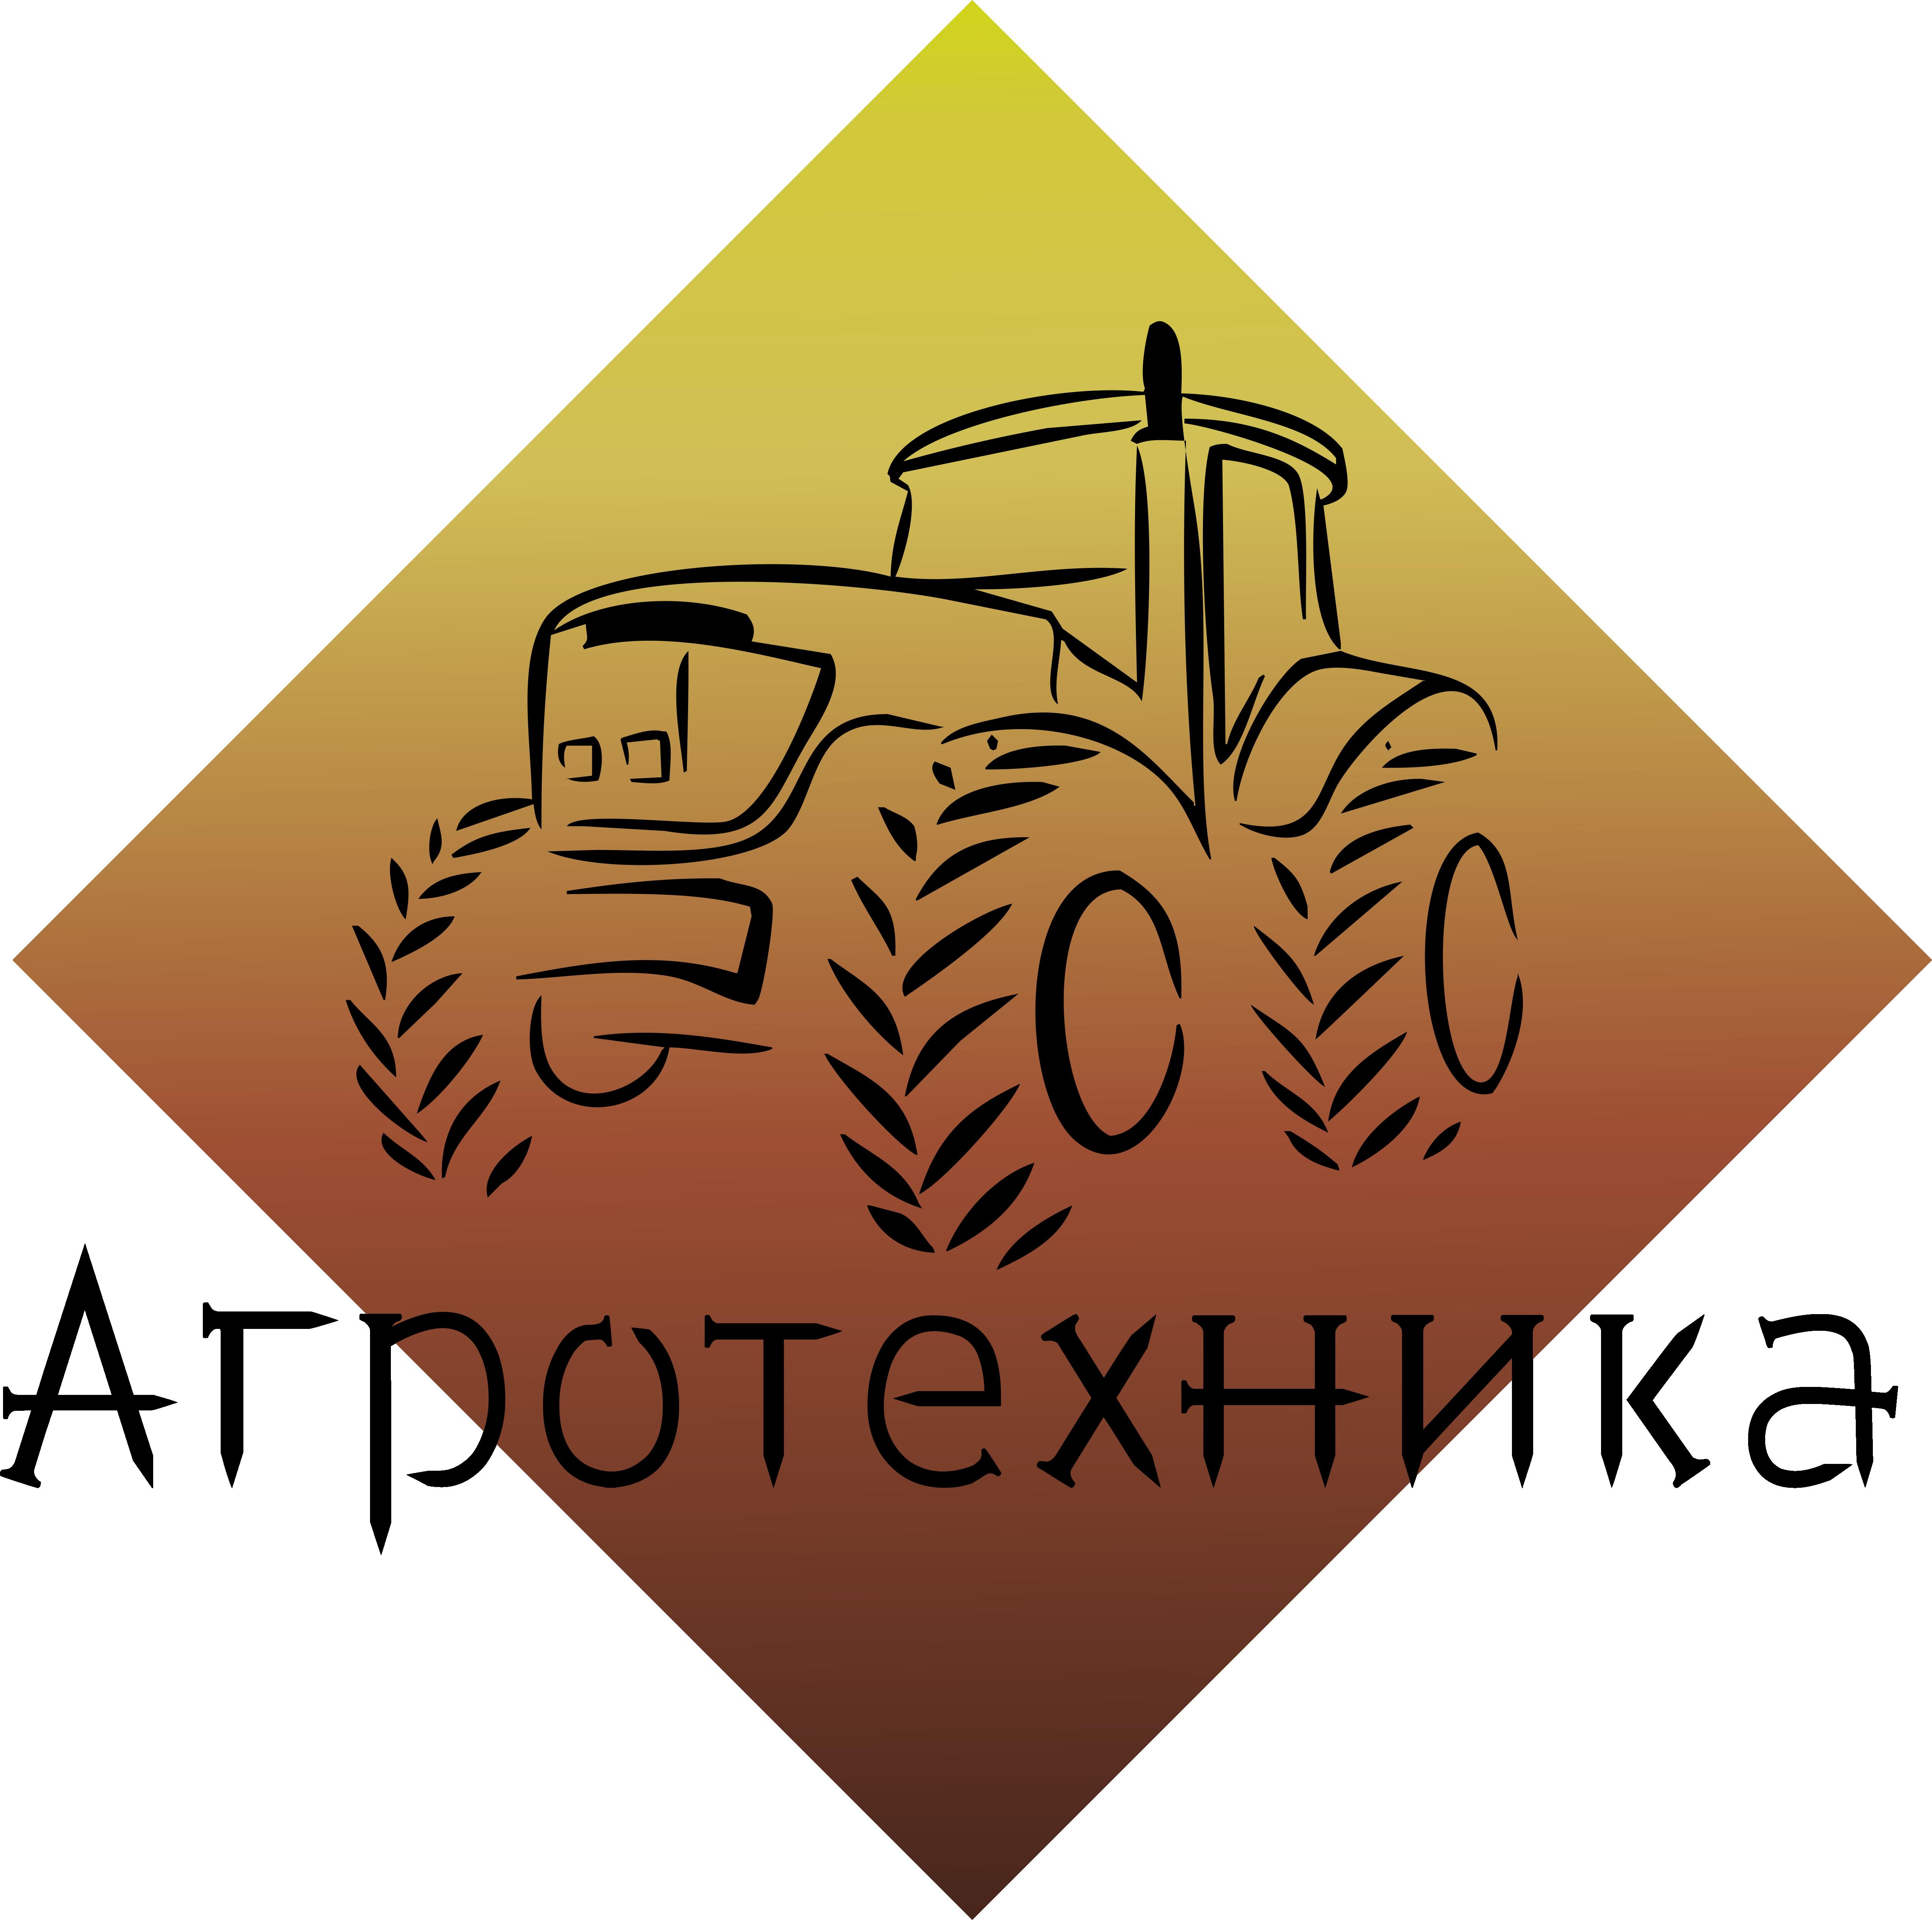 Разработка логотипа для компании Агротехника фото f_9485bffdb93691f8.png